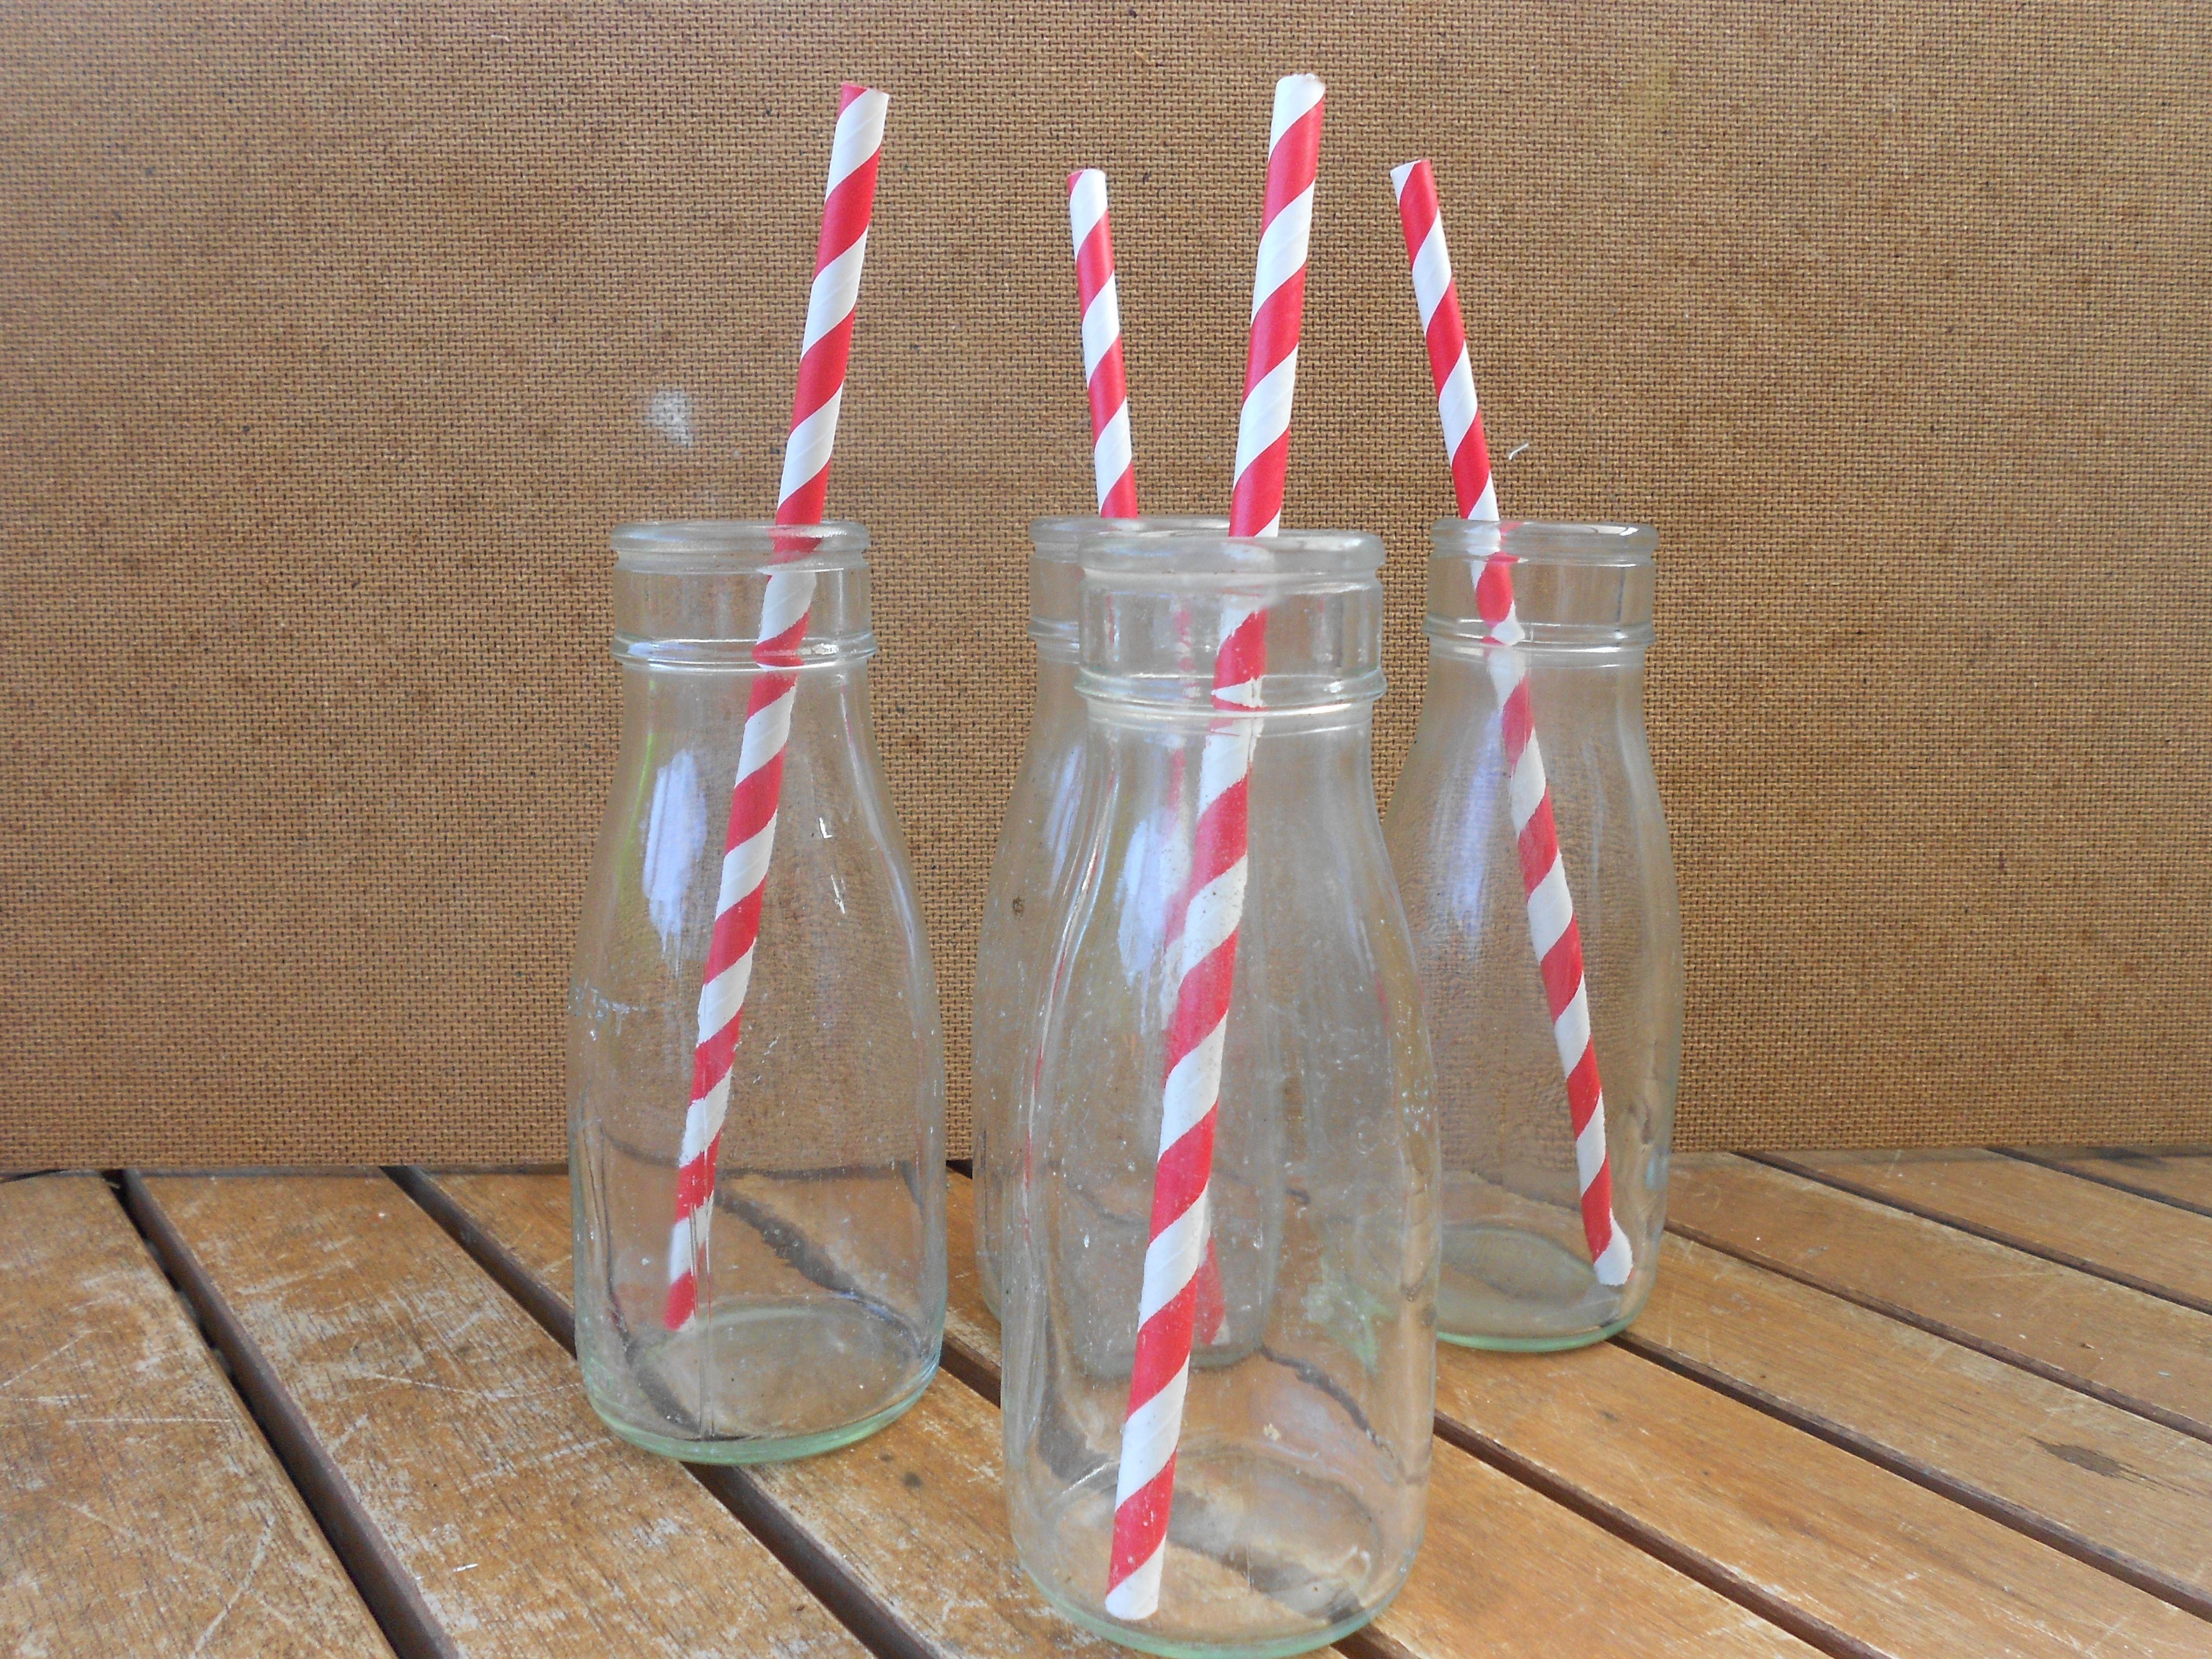 1/3 pnt Old School Milk Bottles, £3.00